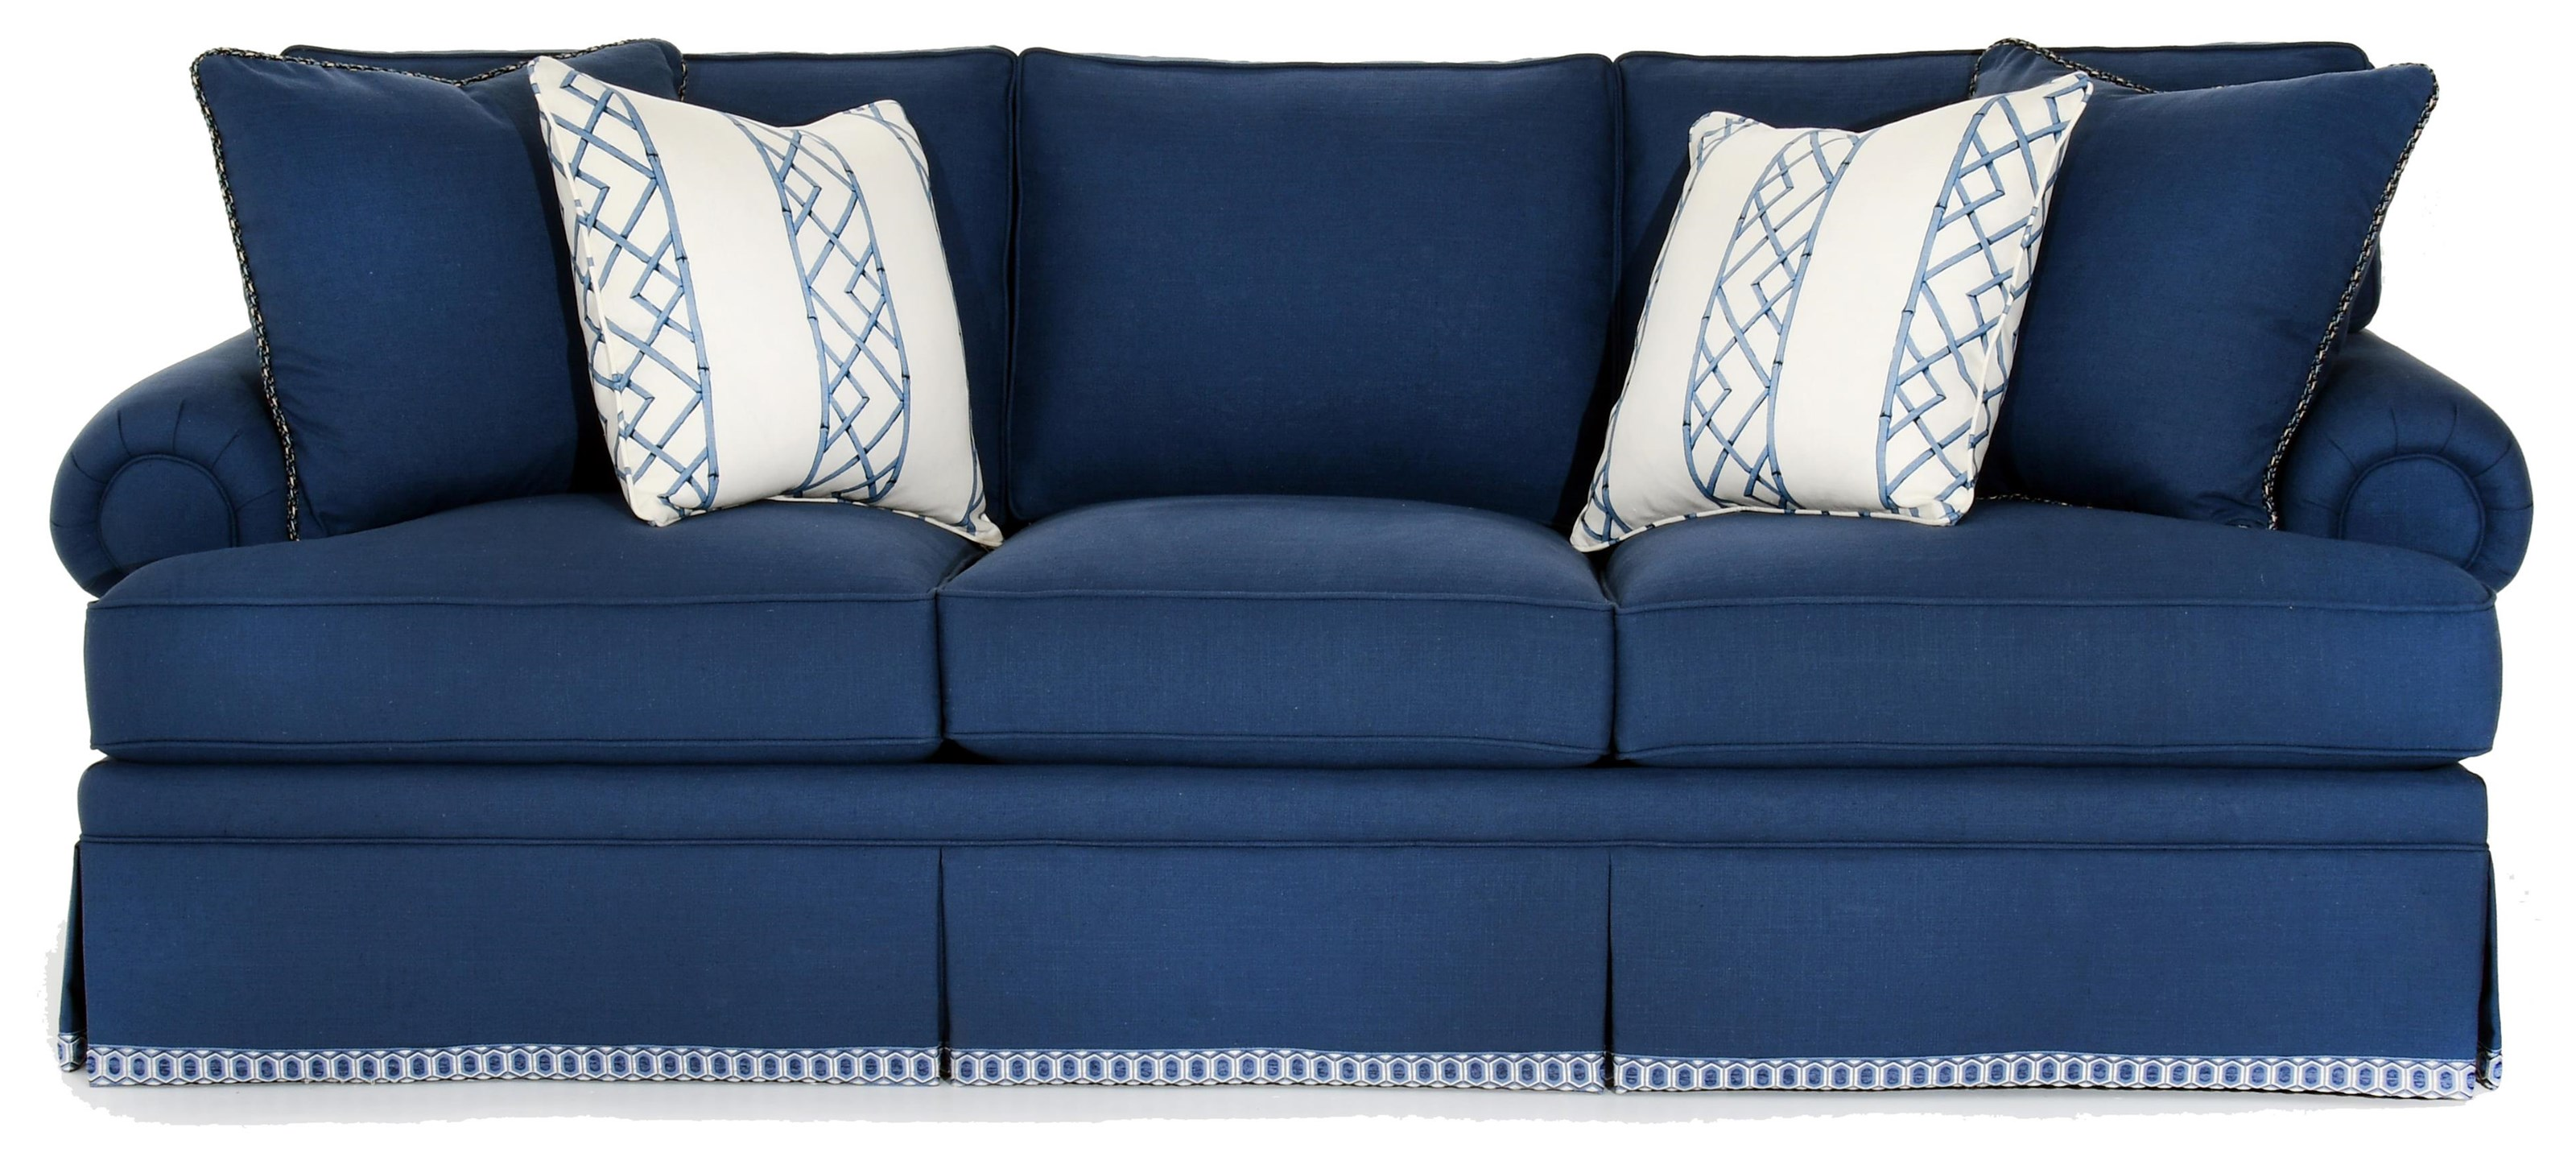 Townsend Customizable Sofa